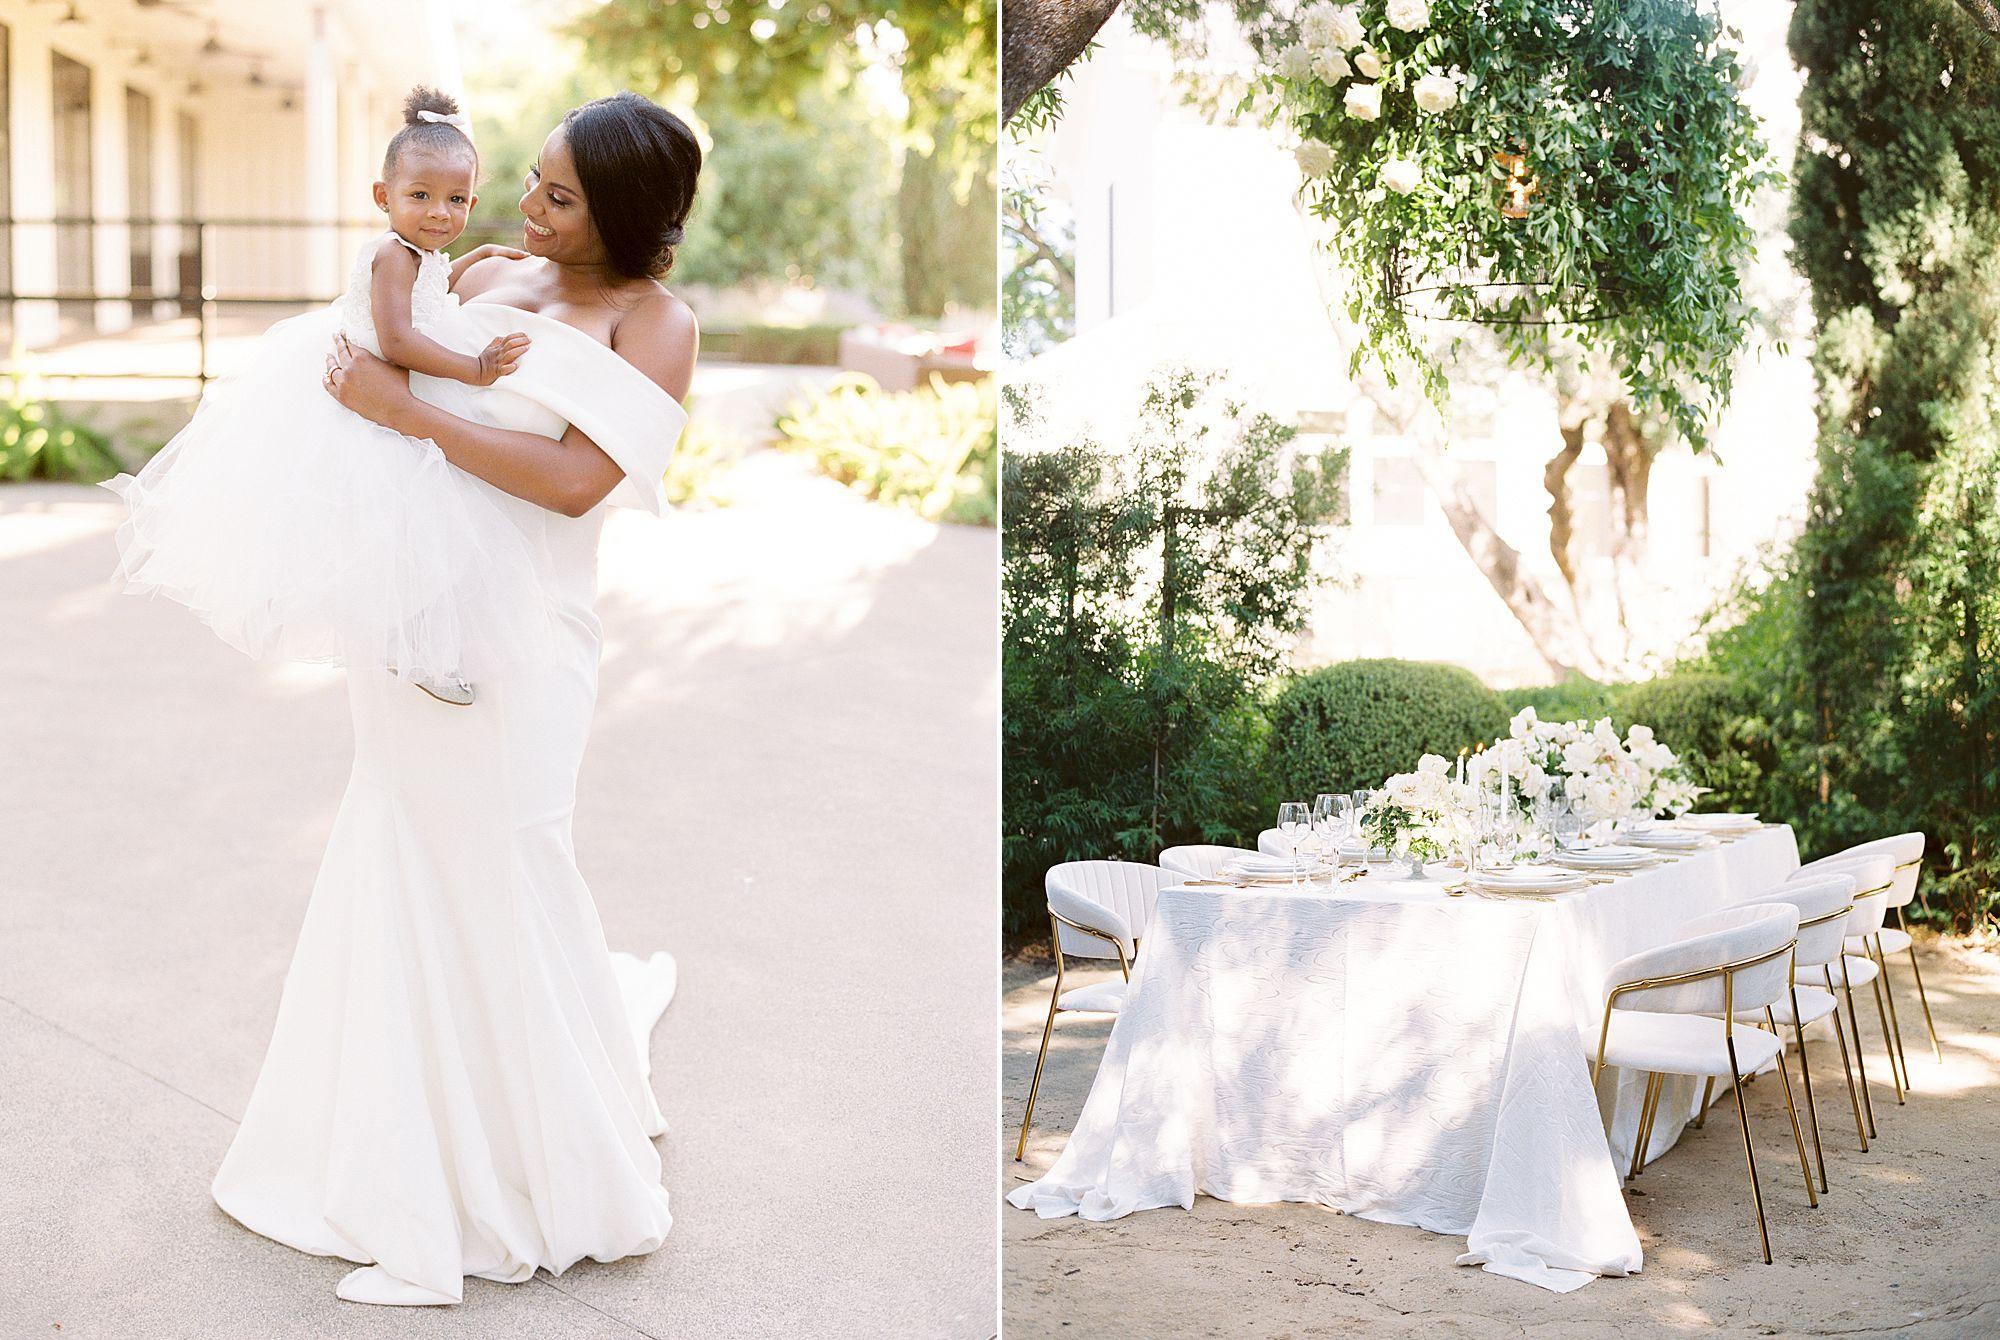 Park Winters Micro-Wedding Inspiration on Style Me Pretty - Stephanie Teague Events - Ashley Baumgartner - Park Winters Wedding - Black Tie Wedding - Micro-Wedding Sacramento Photographer_0007.jpg